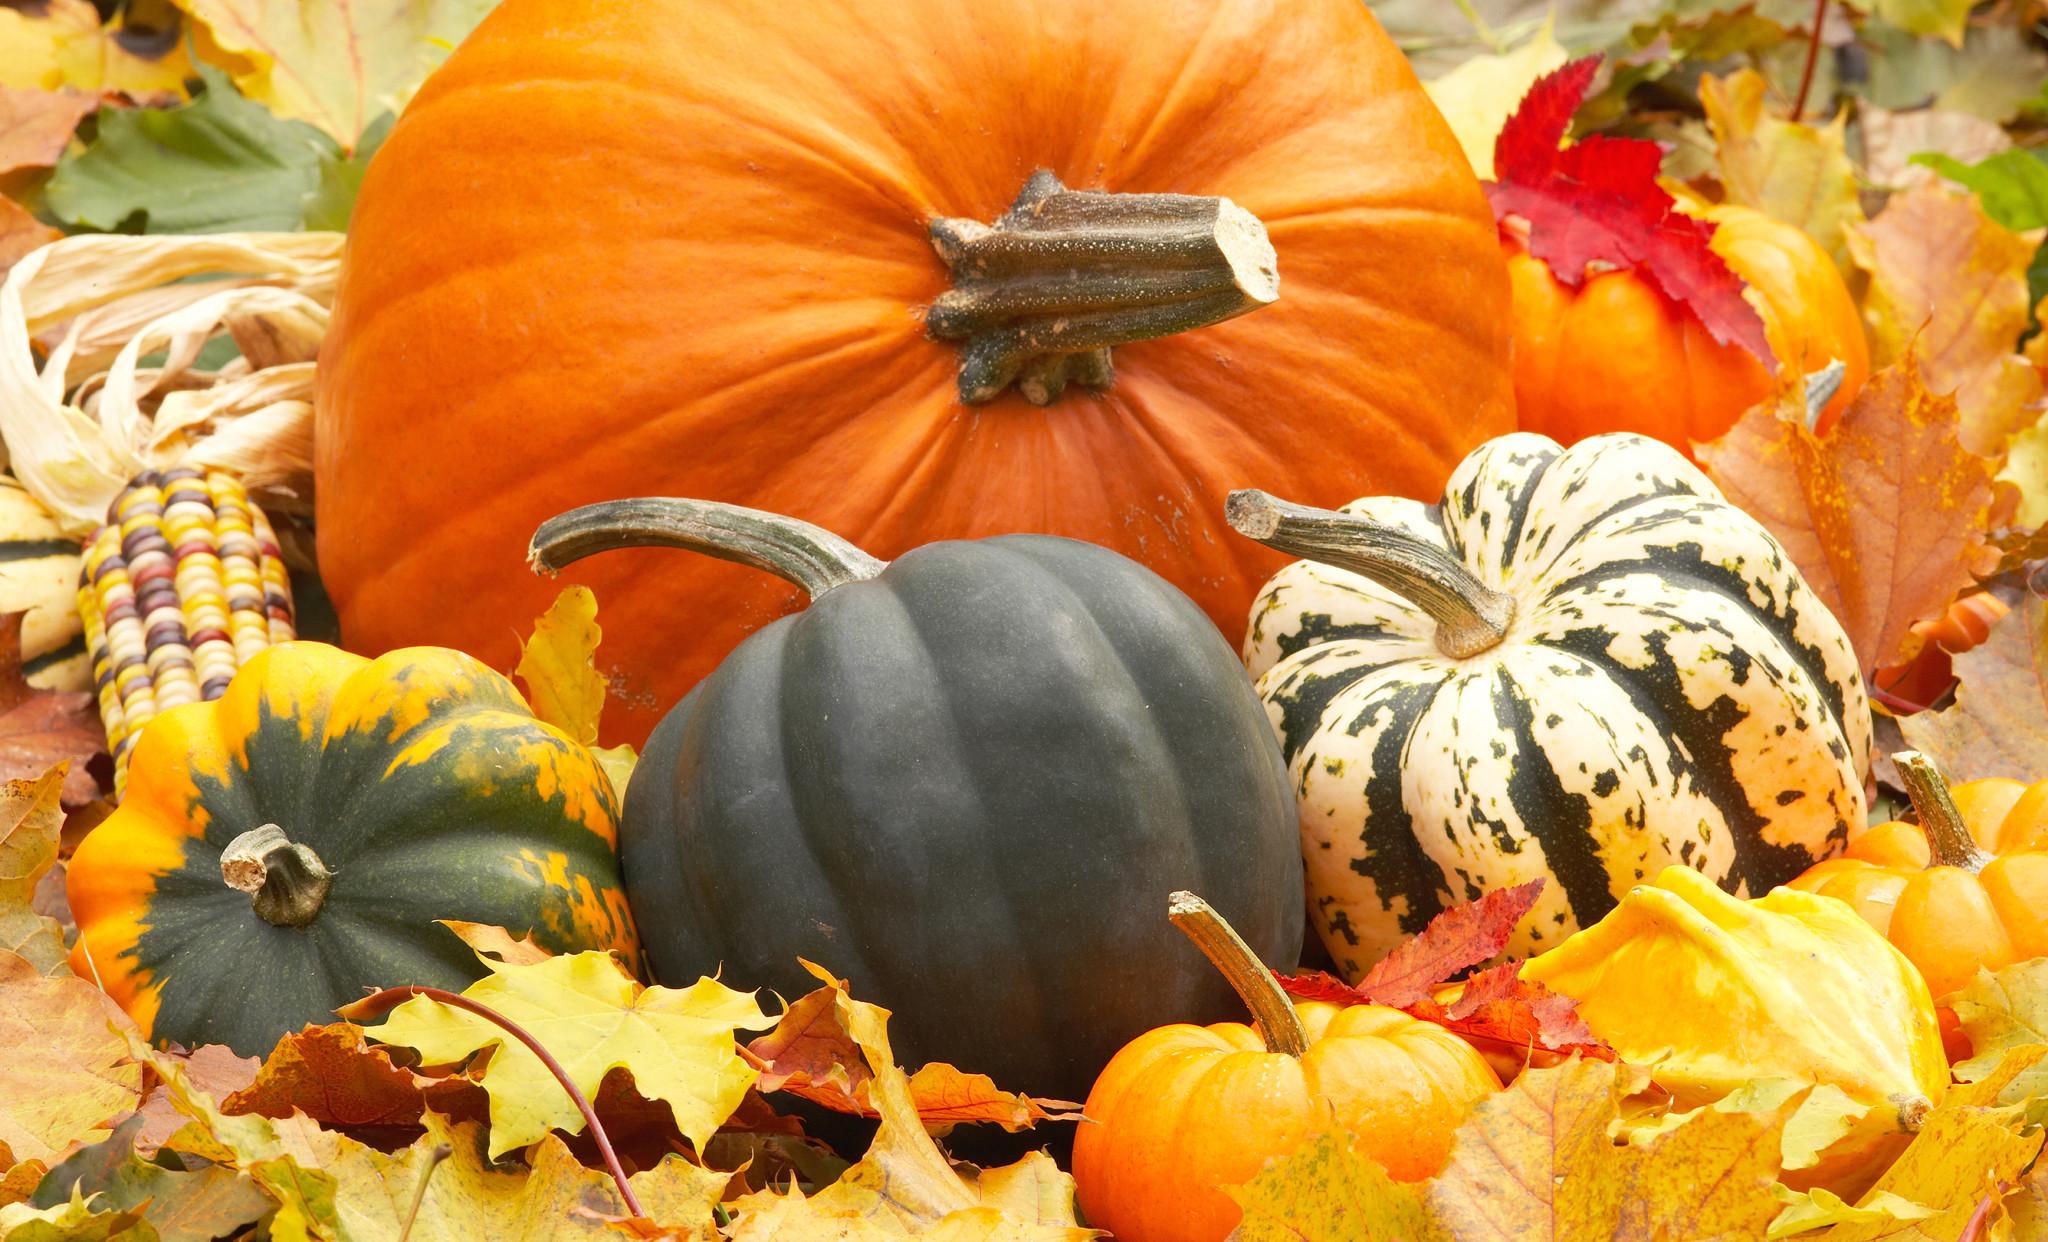 Filename: autumn_harvest_squash_fall_pumpkins_still_hd-wallpaper-1576273.jpg